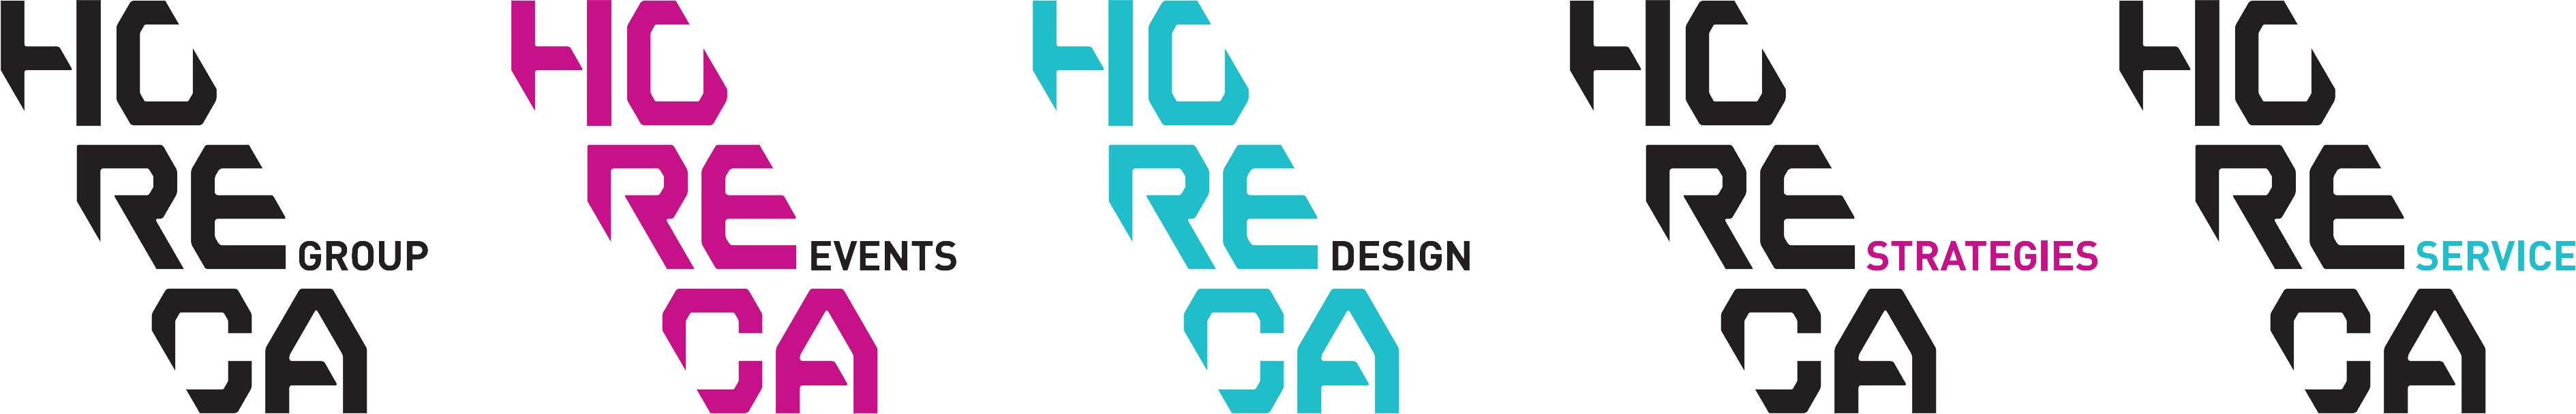 horeca-group-events-design-strategies-service-logo